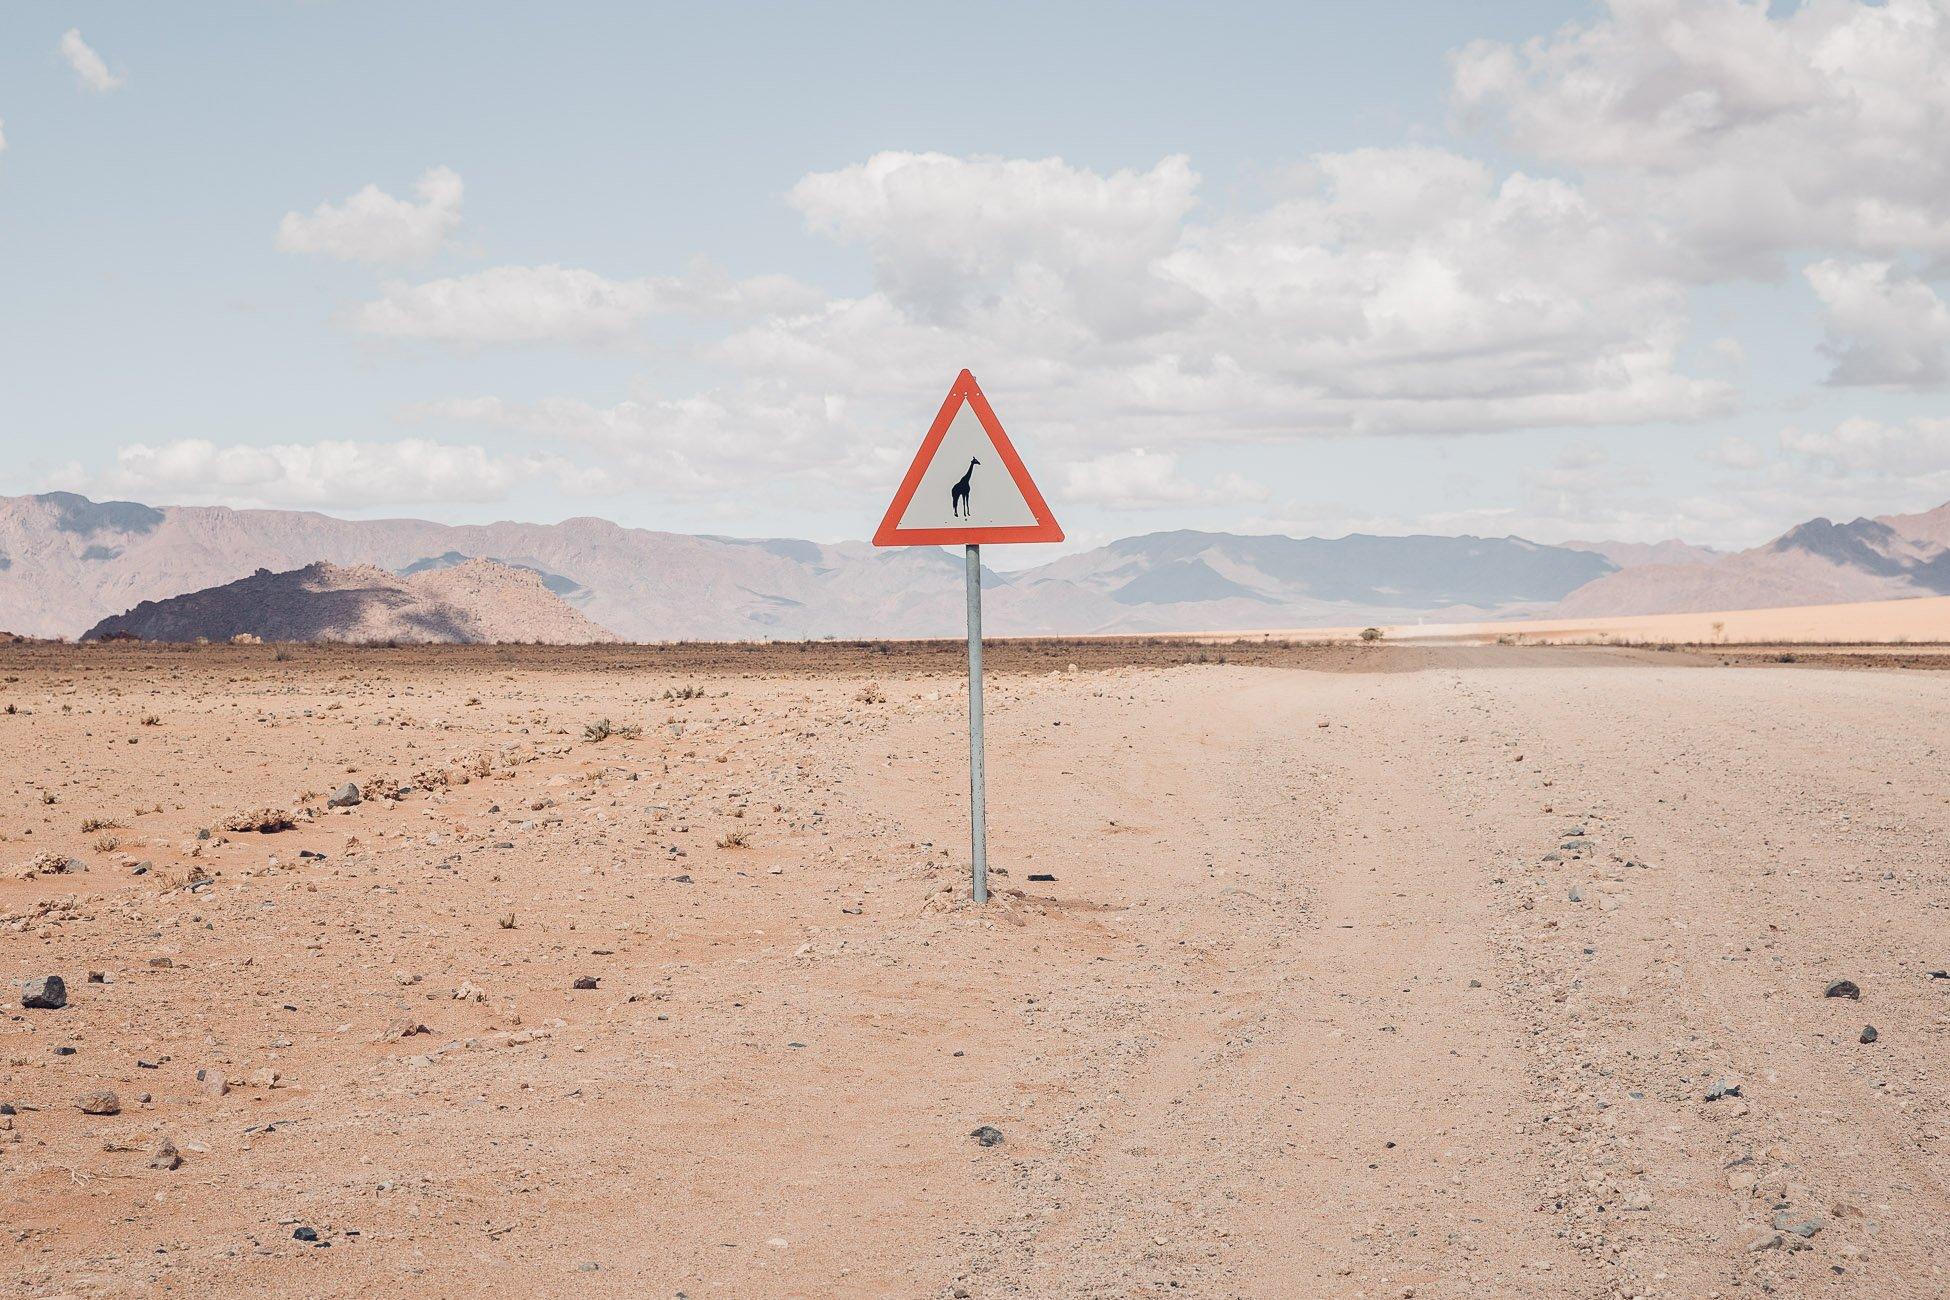 Giraffe crossing in Namibia